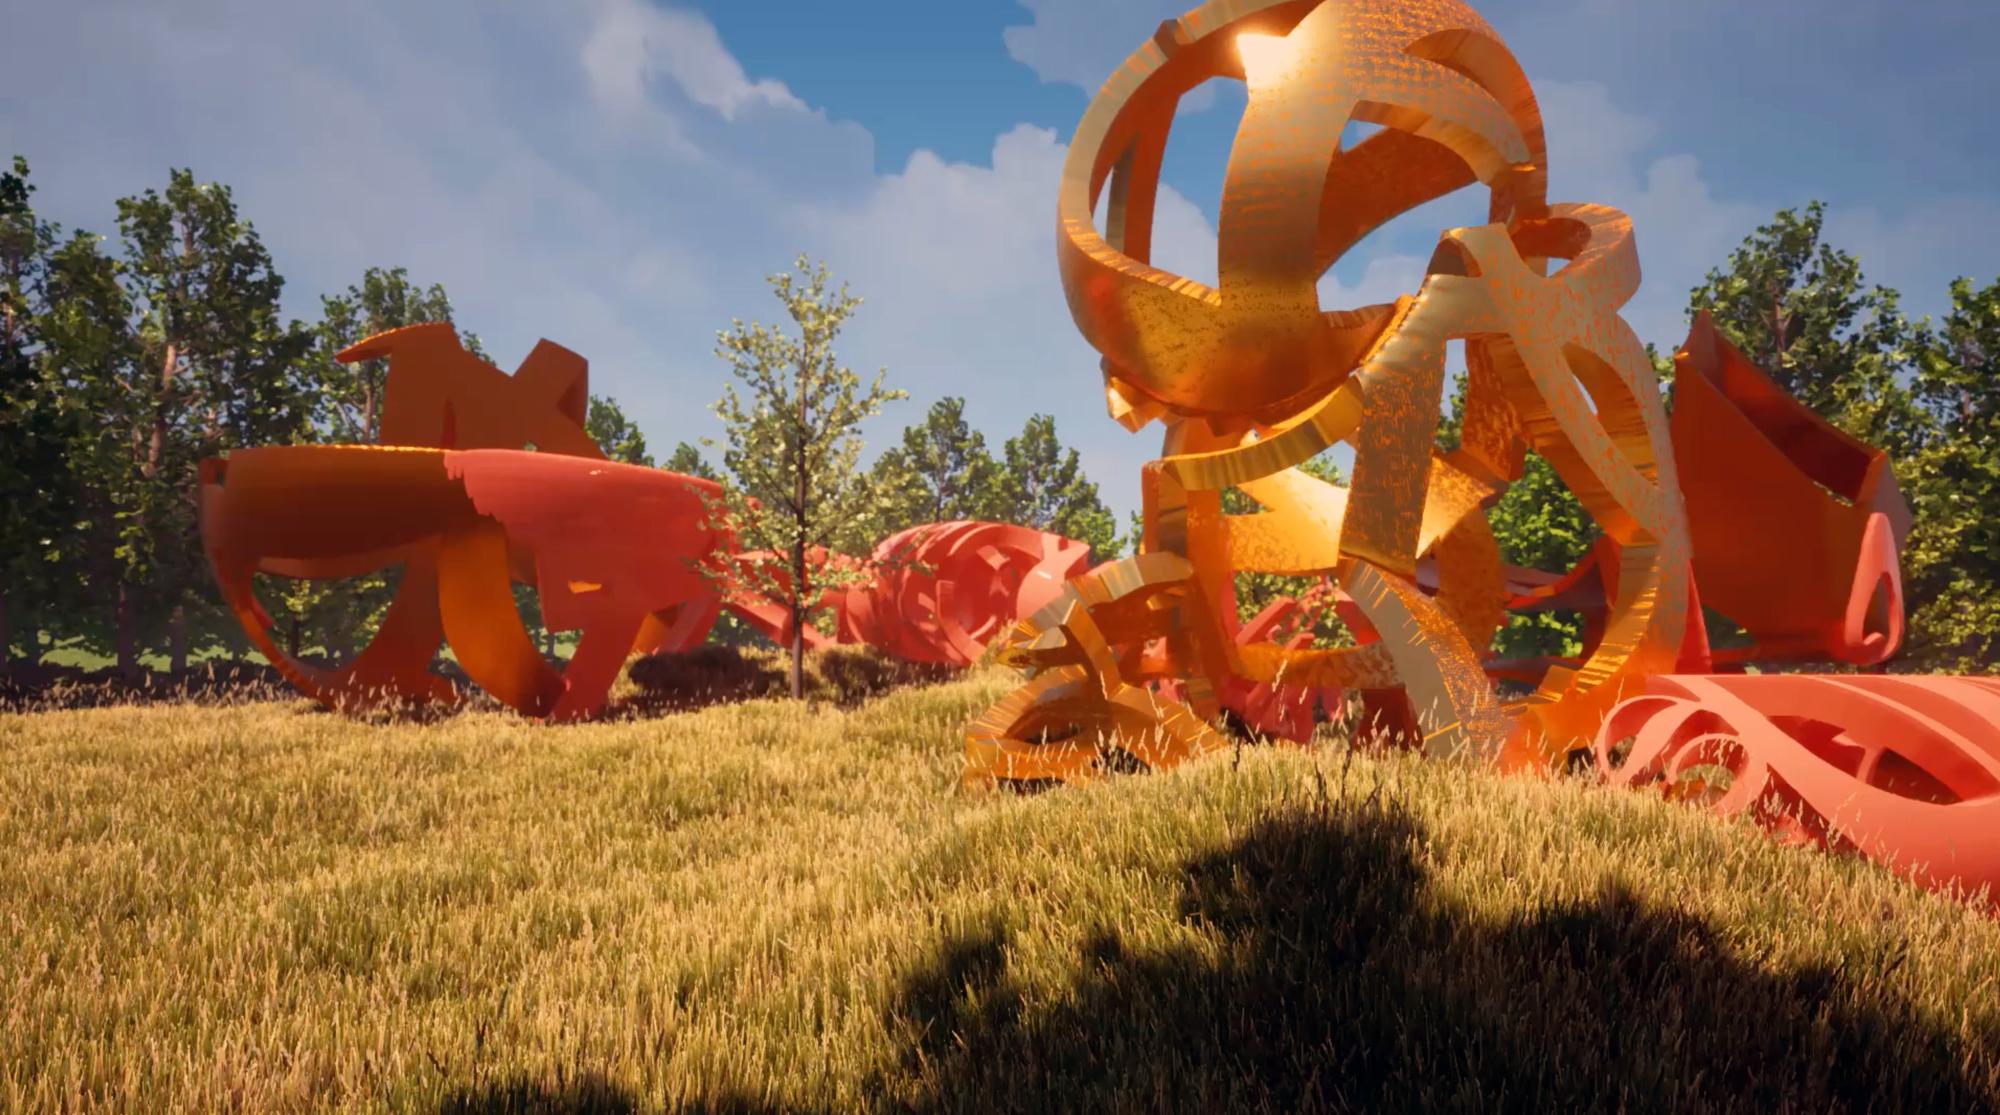 cgi landscape field grass sculpture